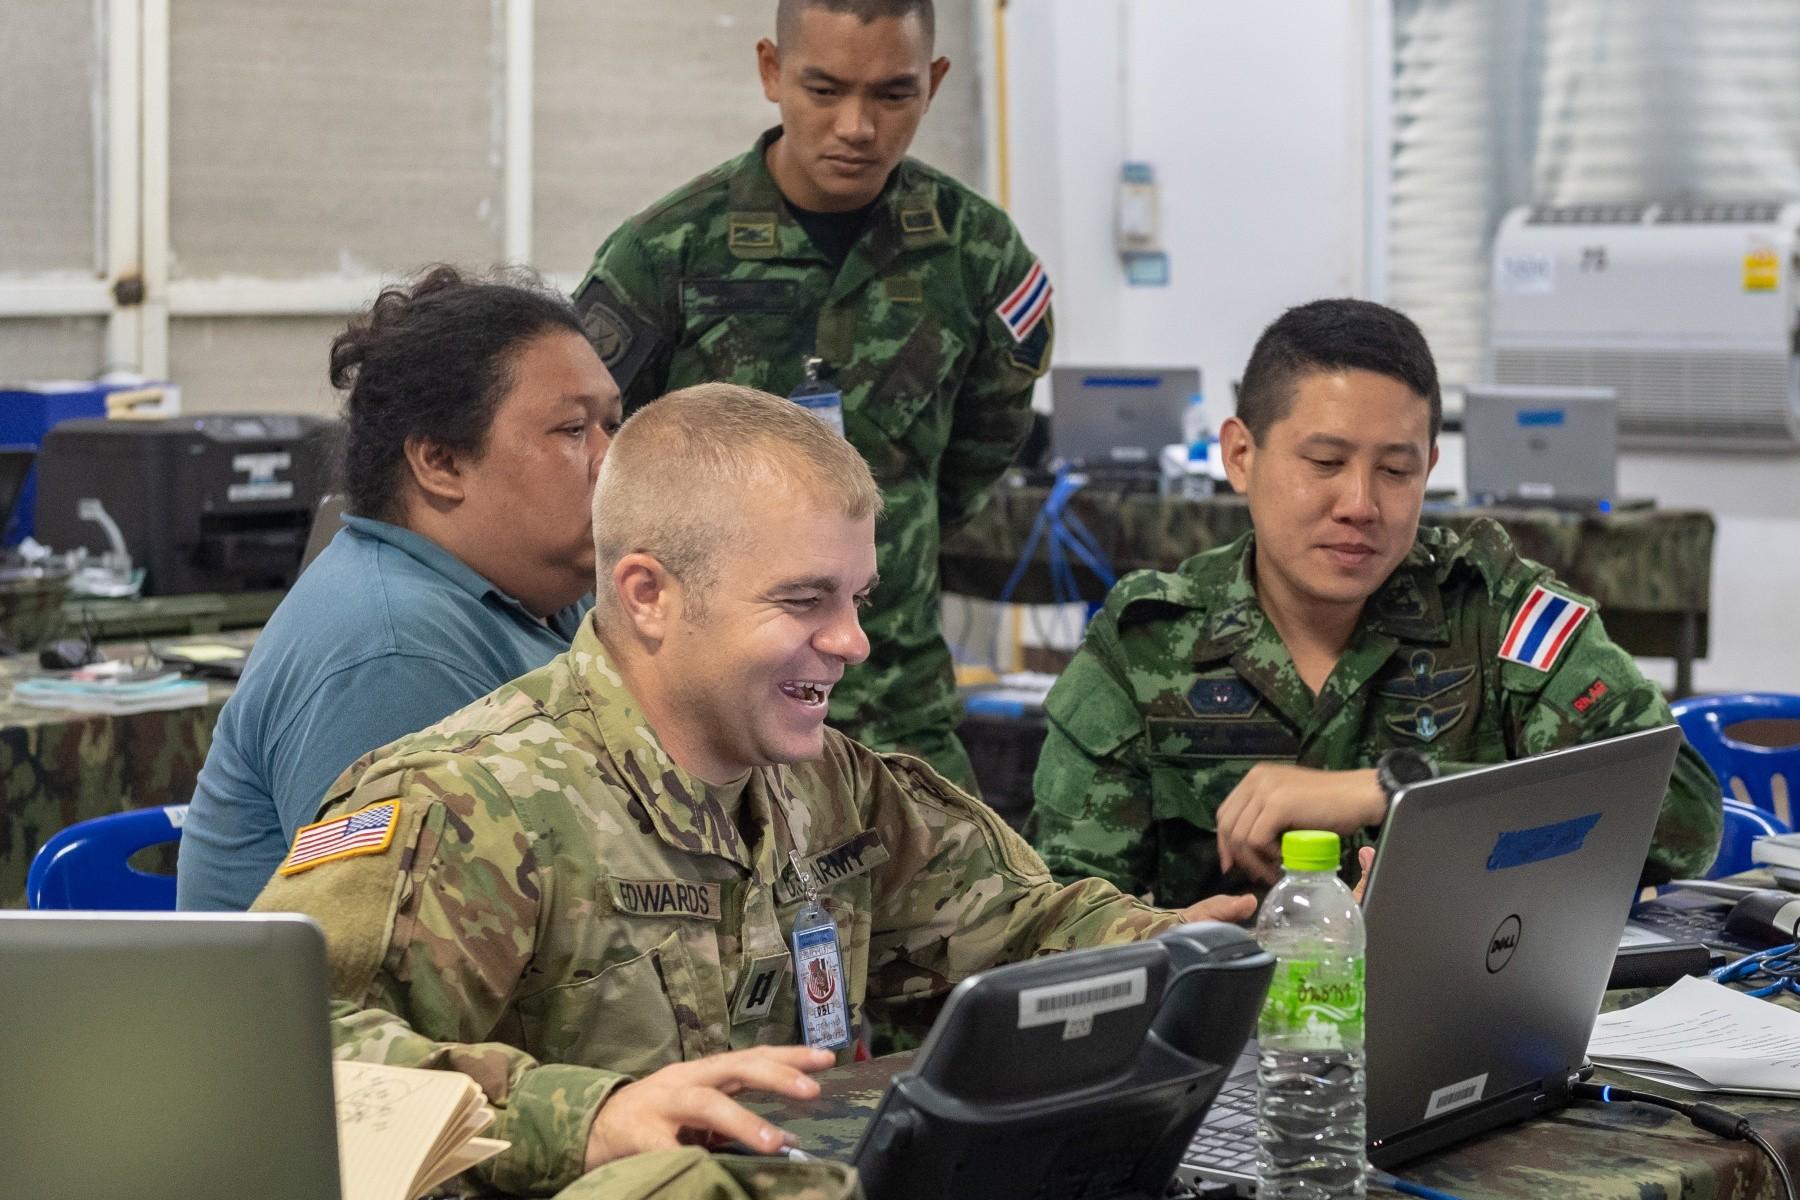 Idaho Army National Guard and Royal Thai Army work together